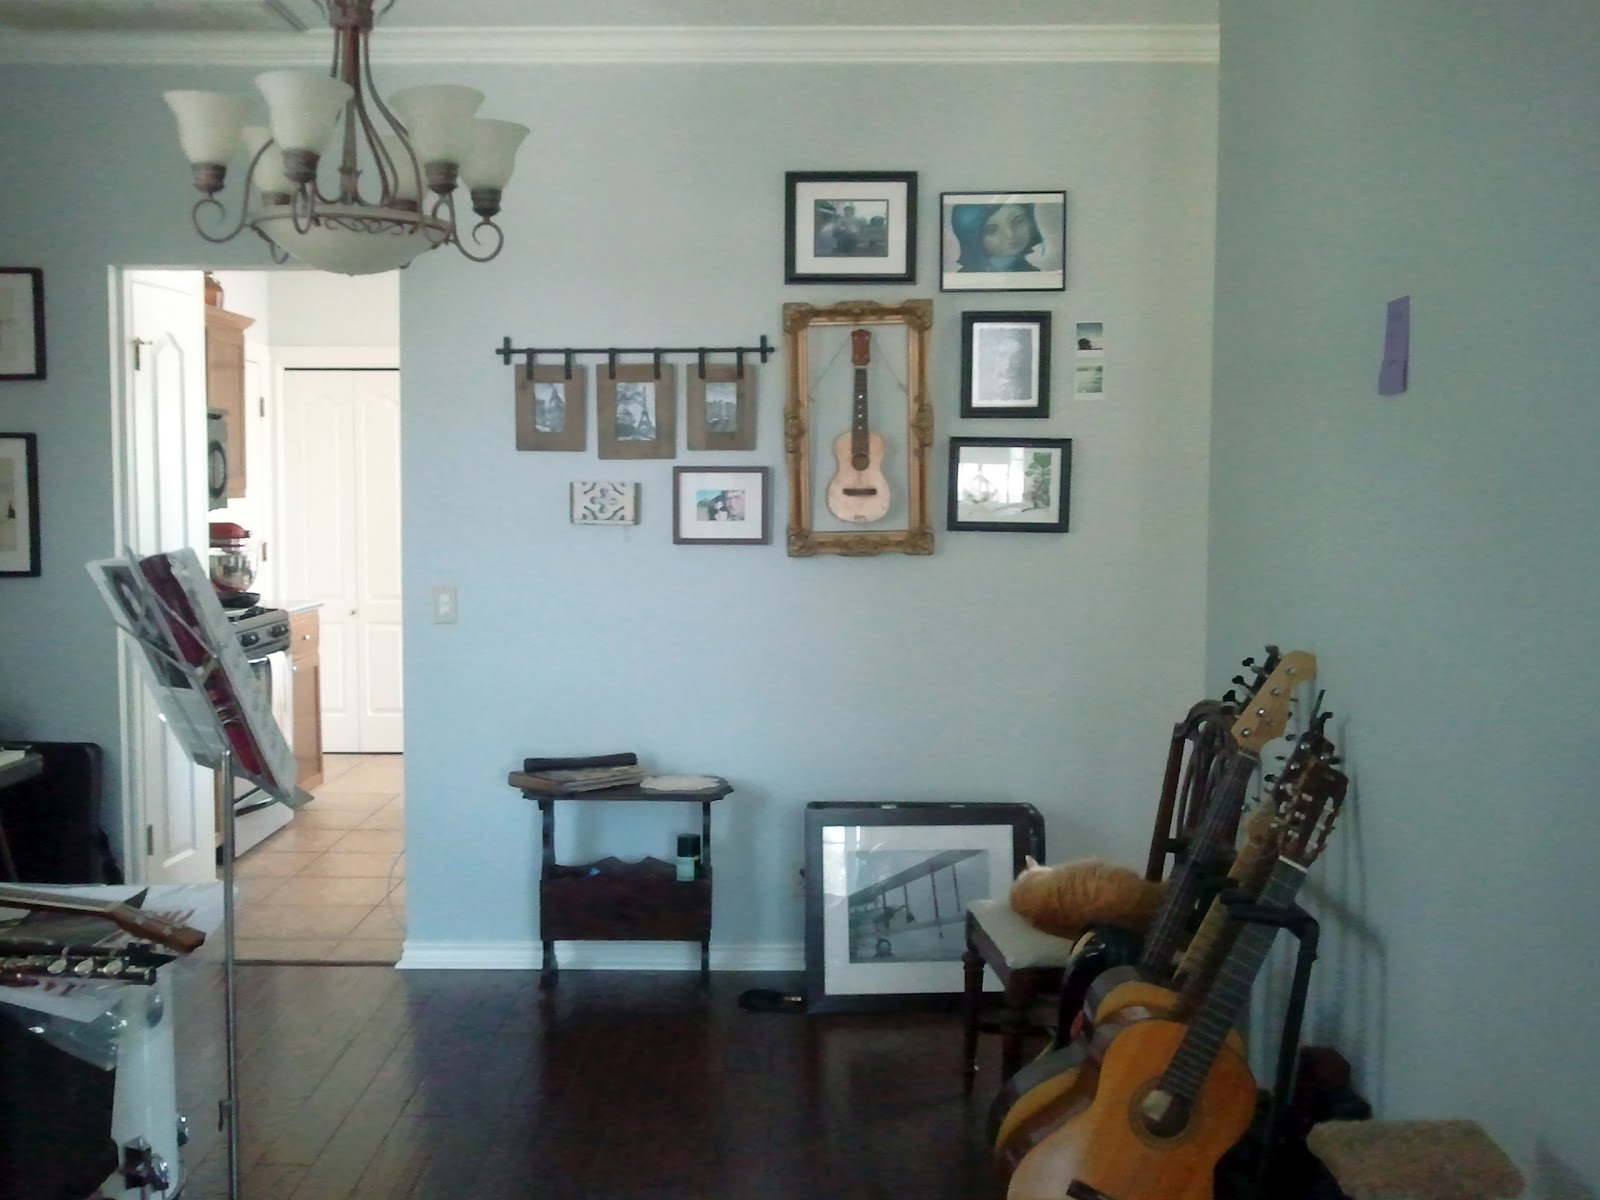 c b i d home decor and design warm grey. Black Bedroom Furniture Sets. Home Design Ideas